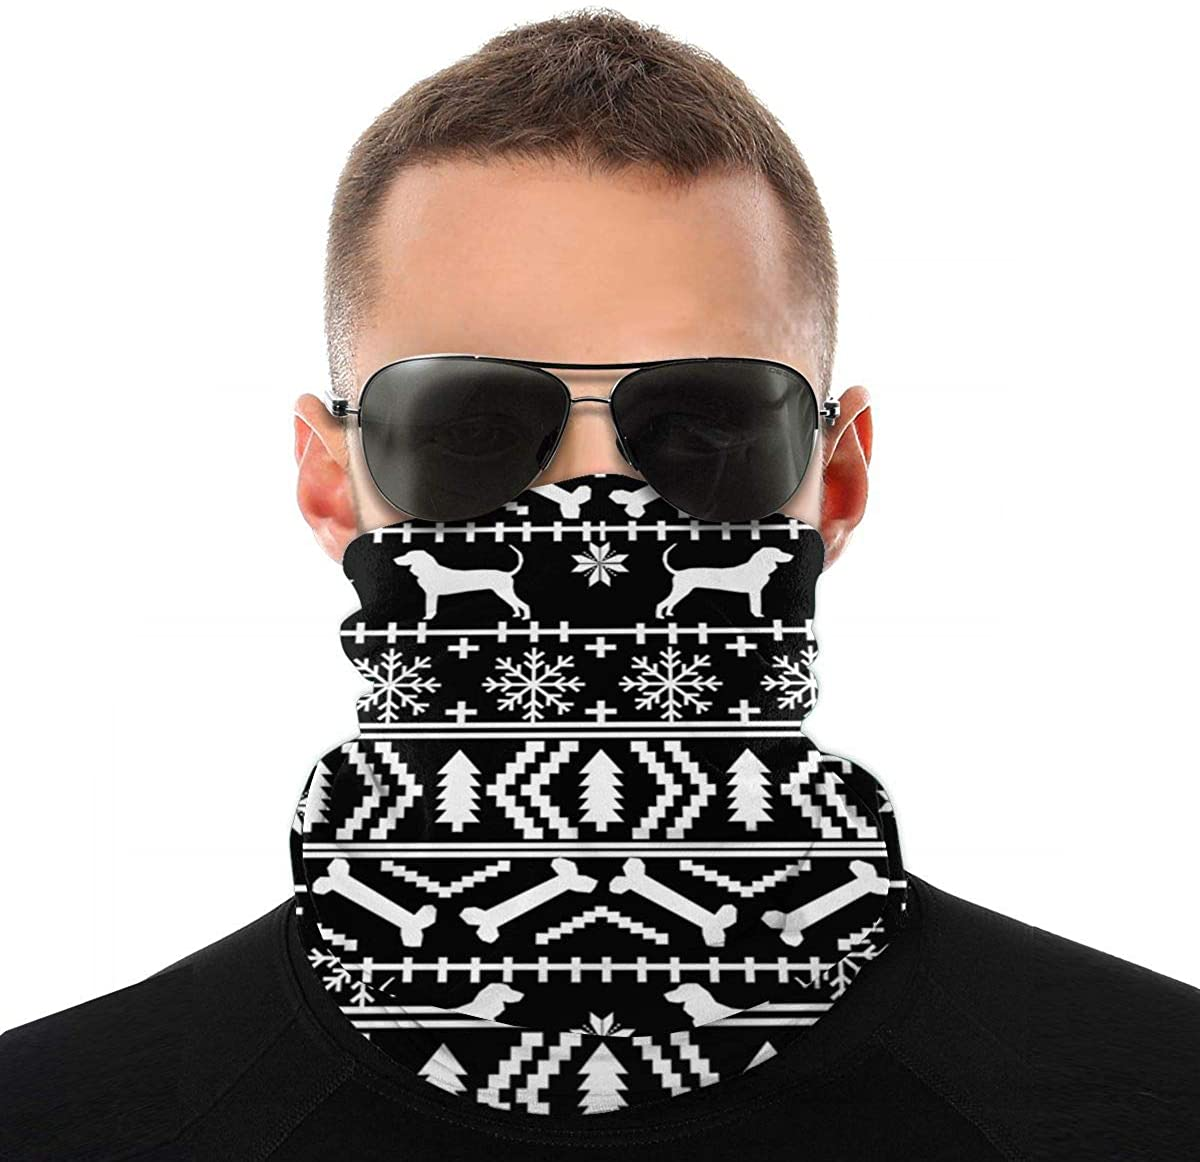 Coonhound Variety Head Scarf, Multifunctional Bandanas & Balaclava Anti Dust for Outdoors, Festivals, Sports